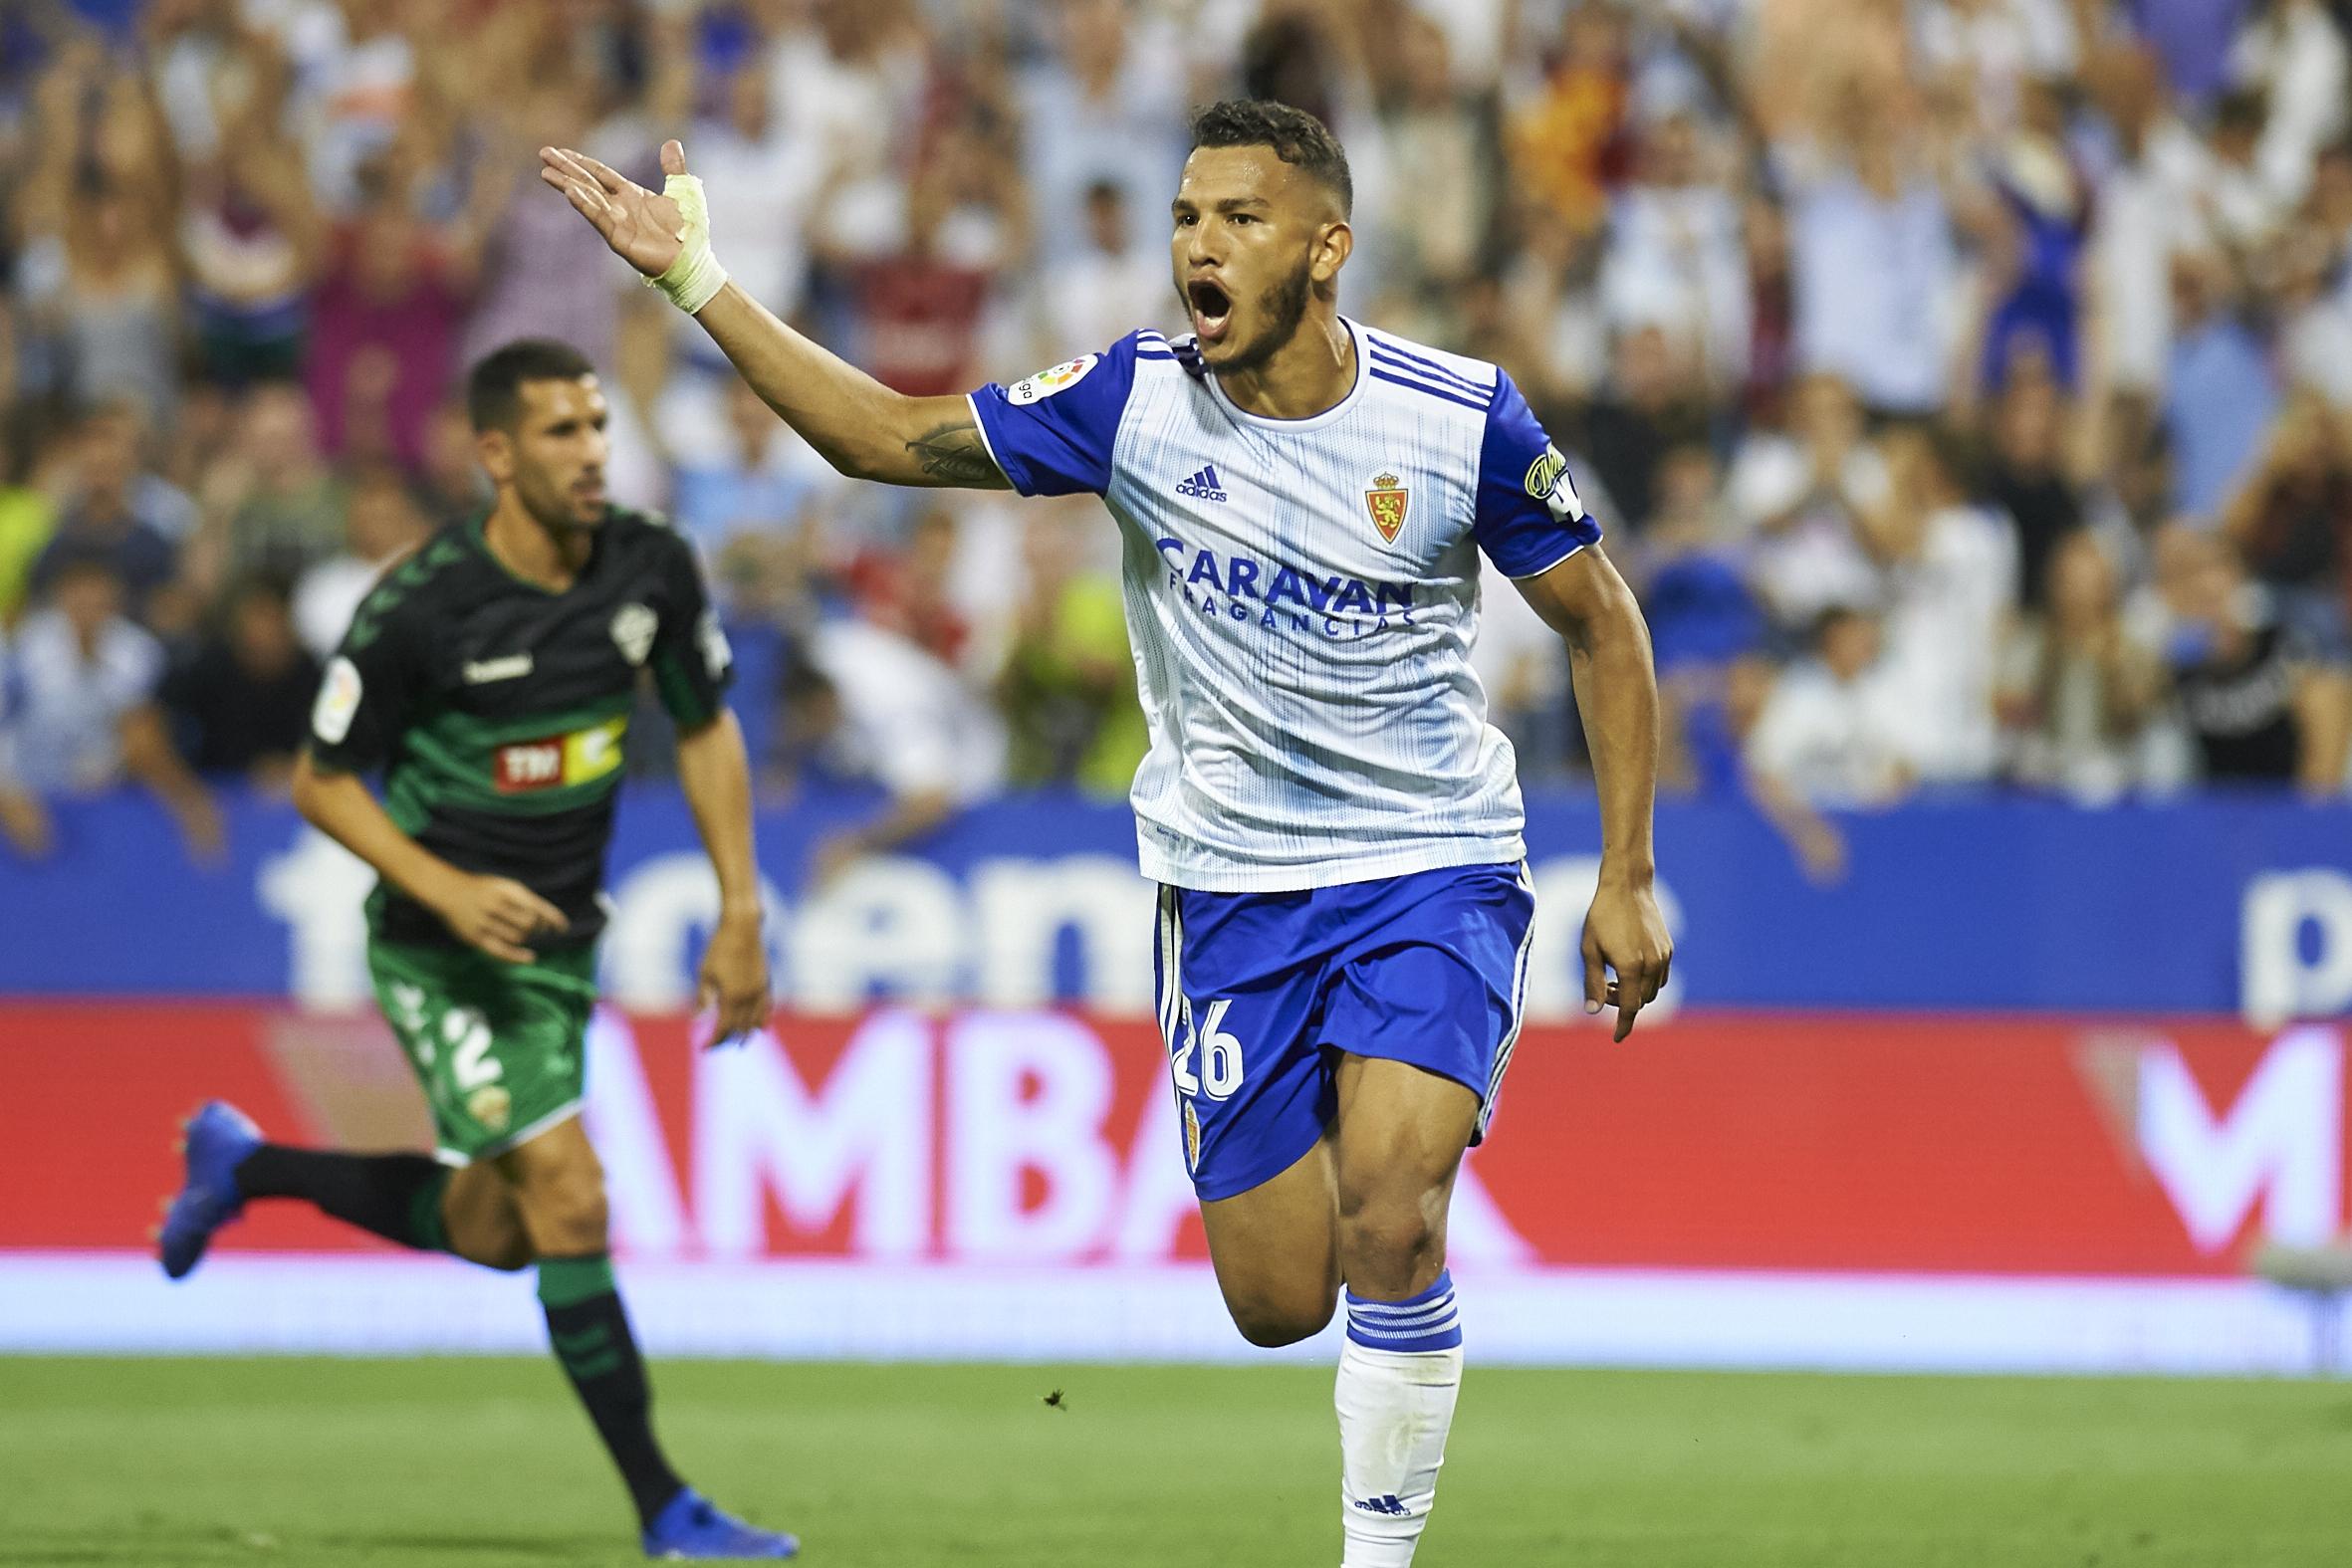 Watford forward Luis Suarez could not continue his scoring streak in Real Zaragoza's defeat to Cadiz